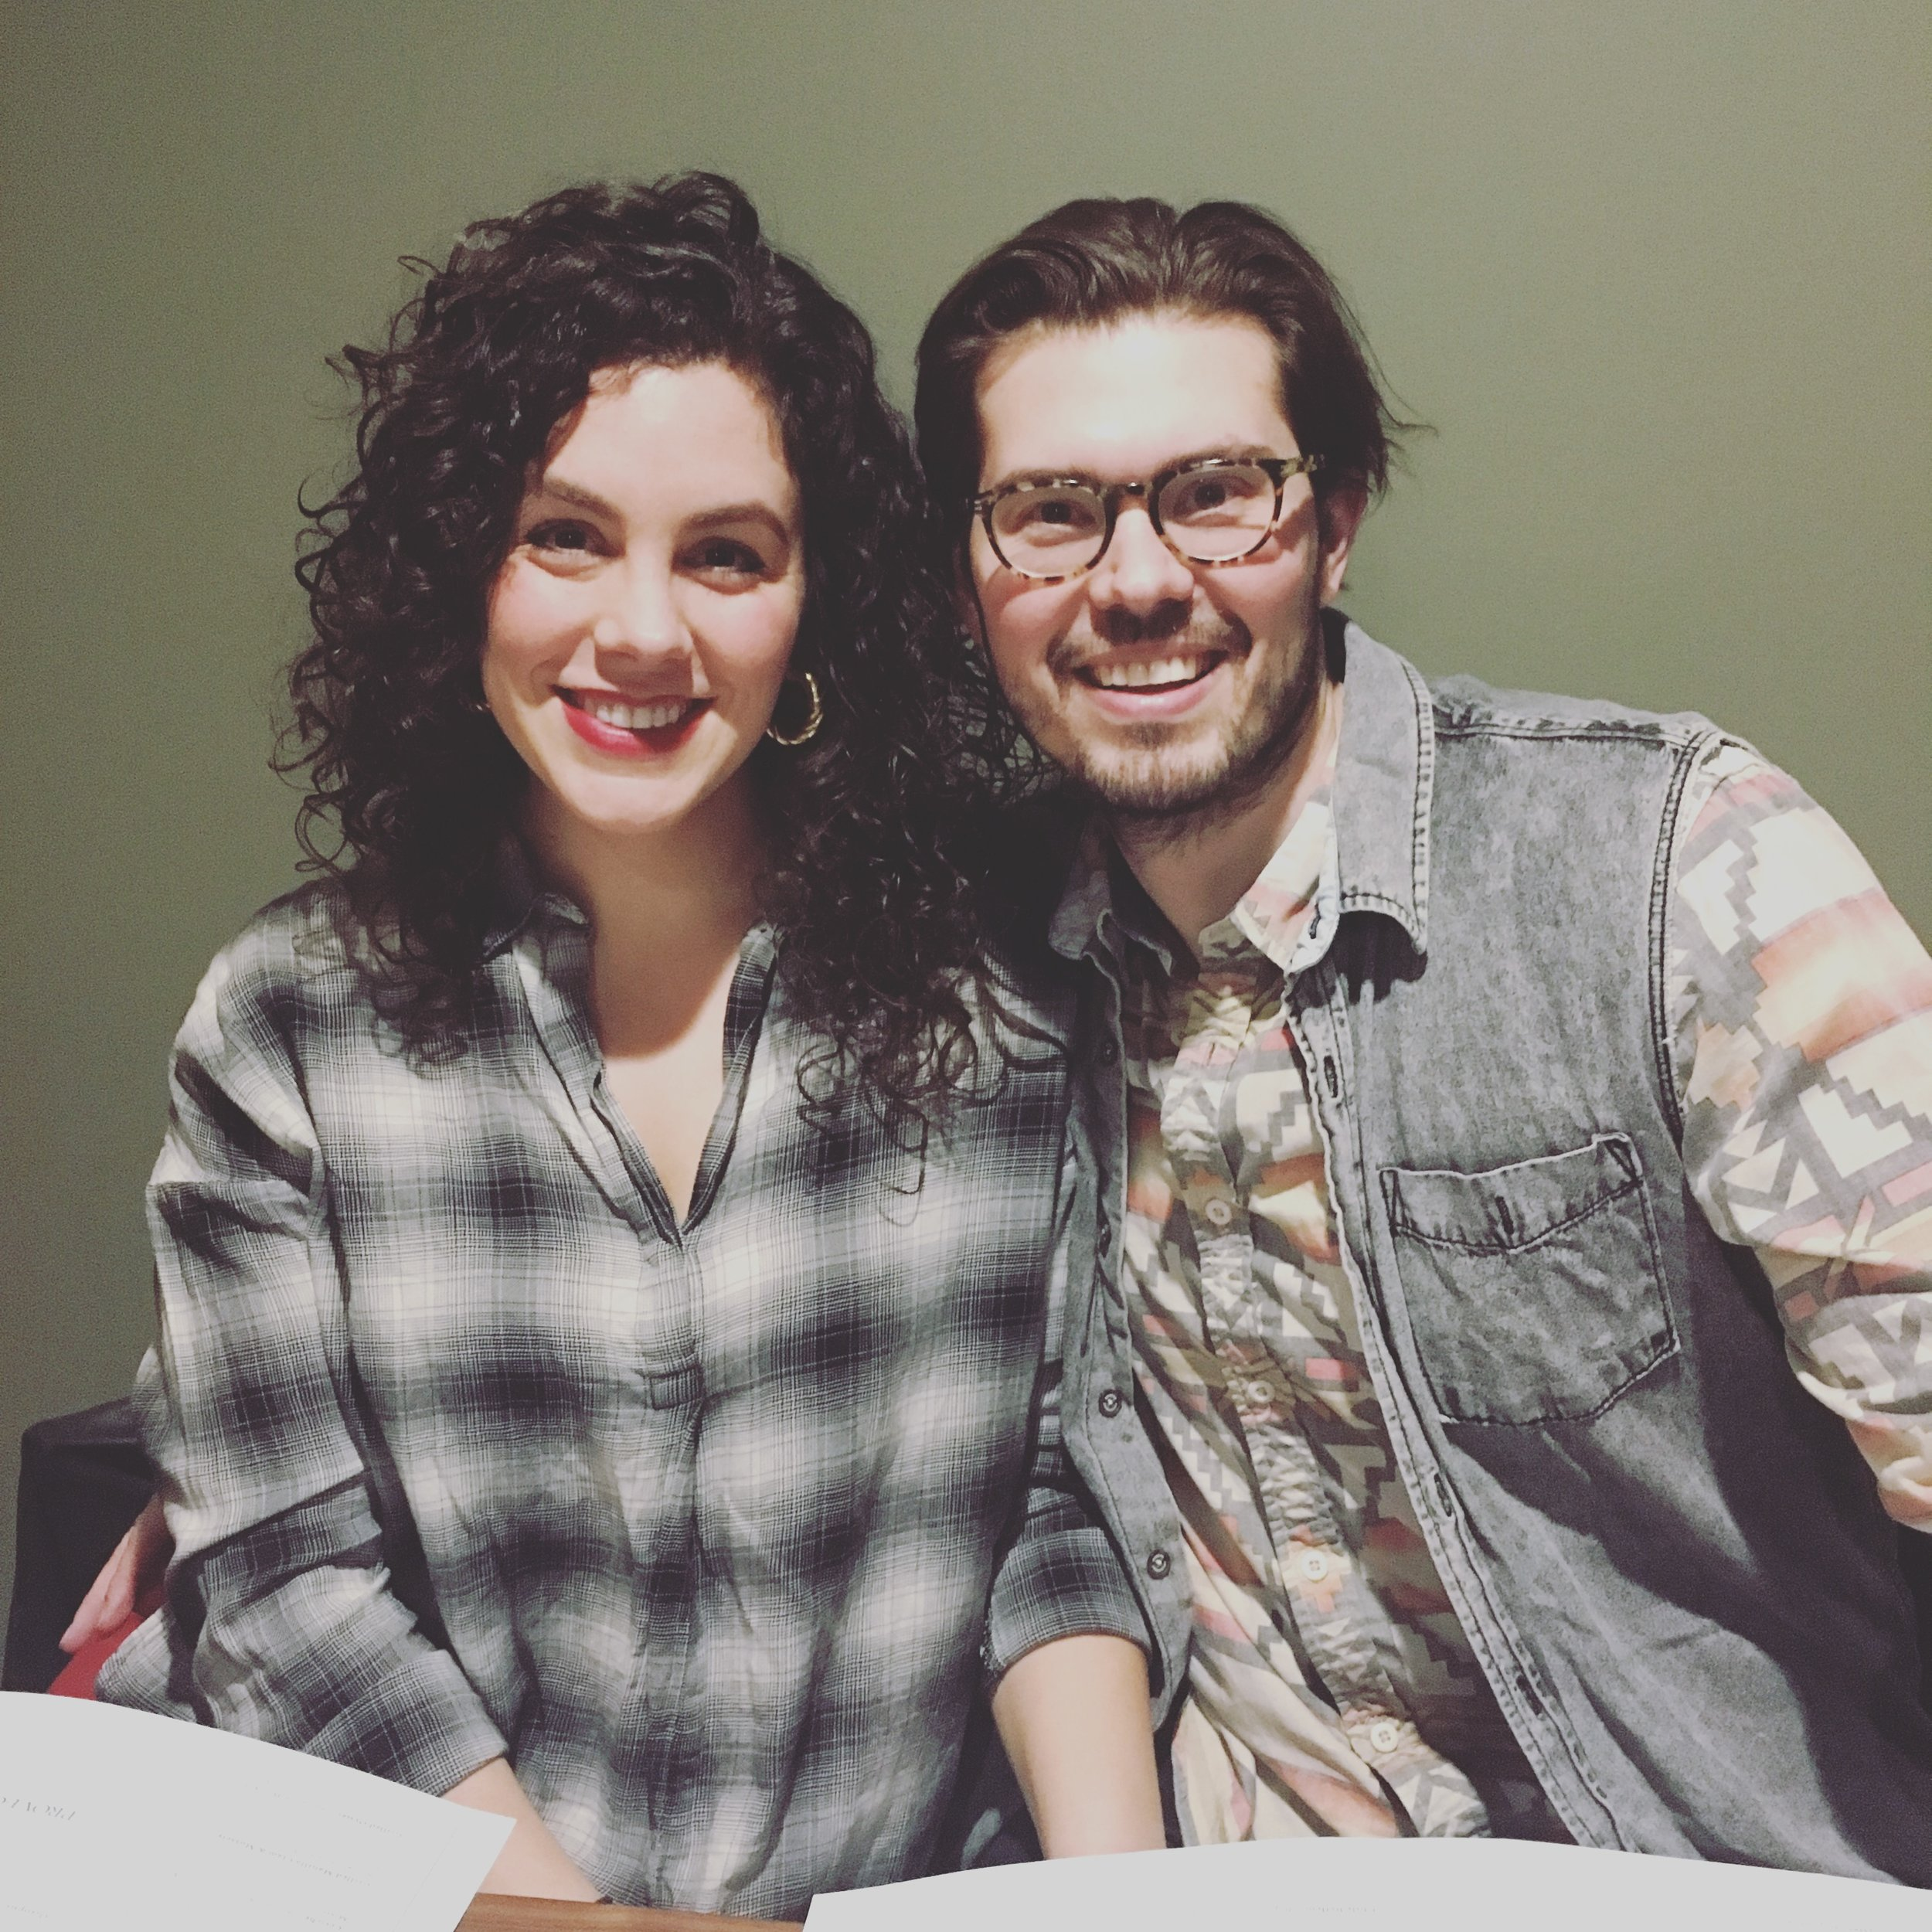 Evvie & Justin - Co-Creators